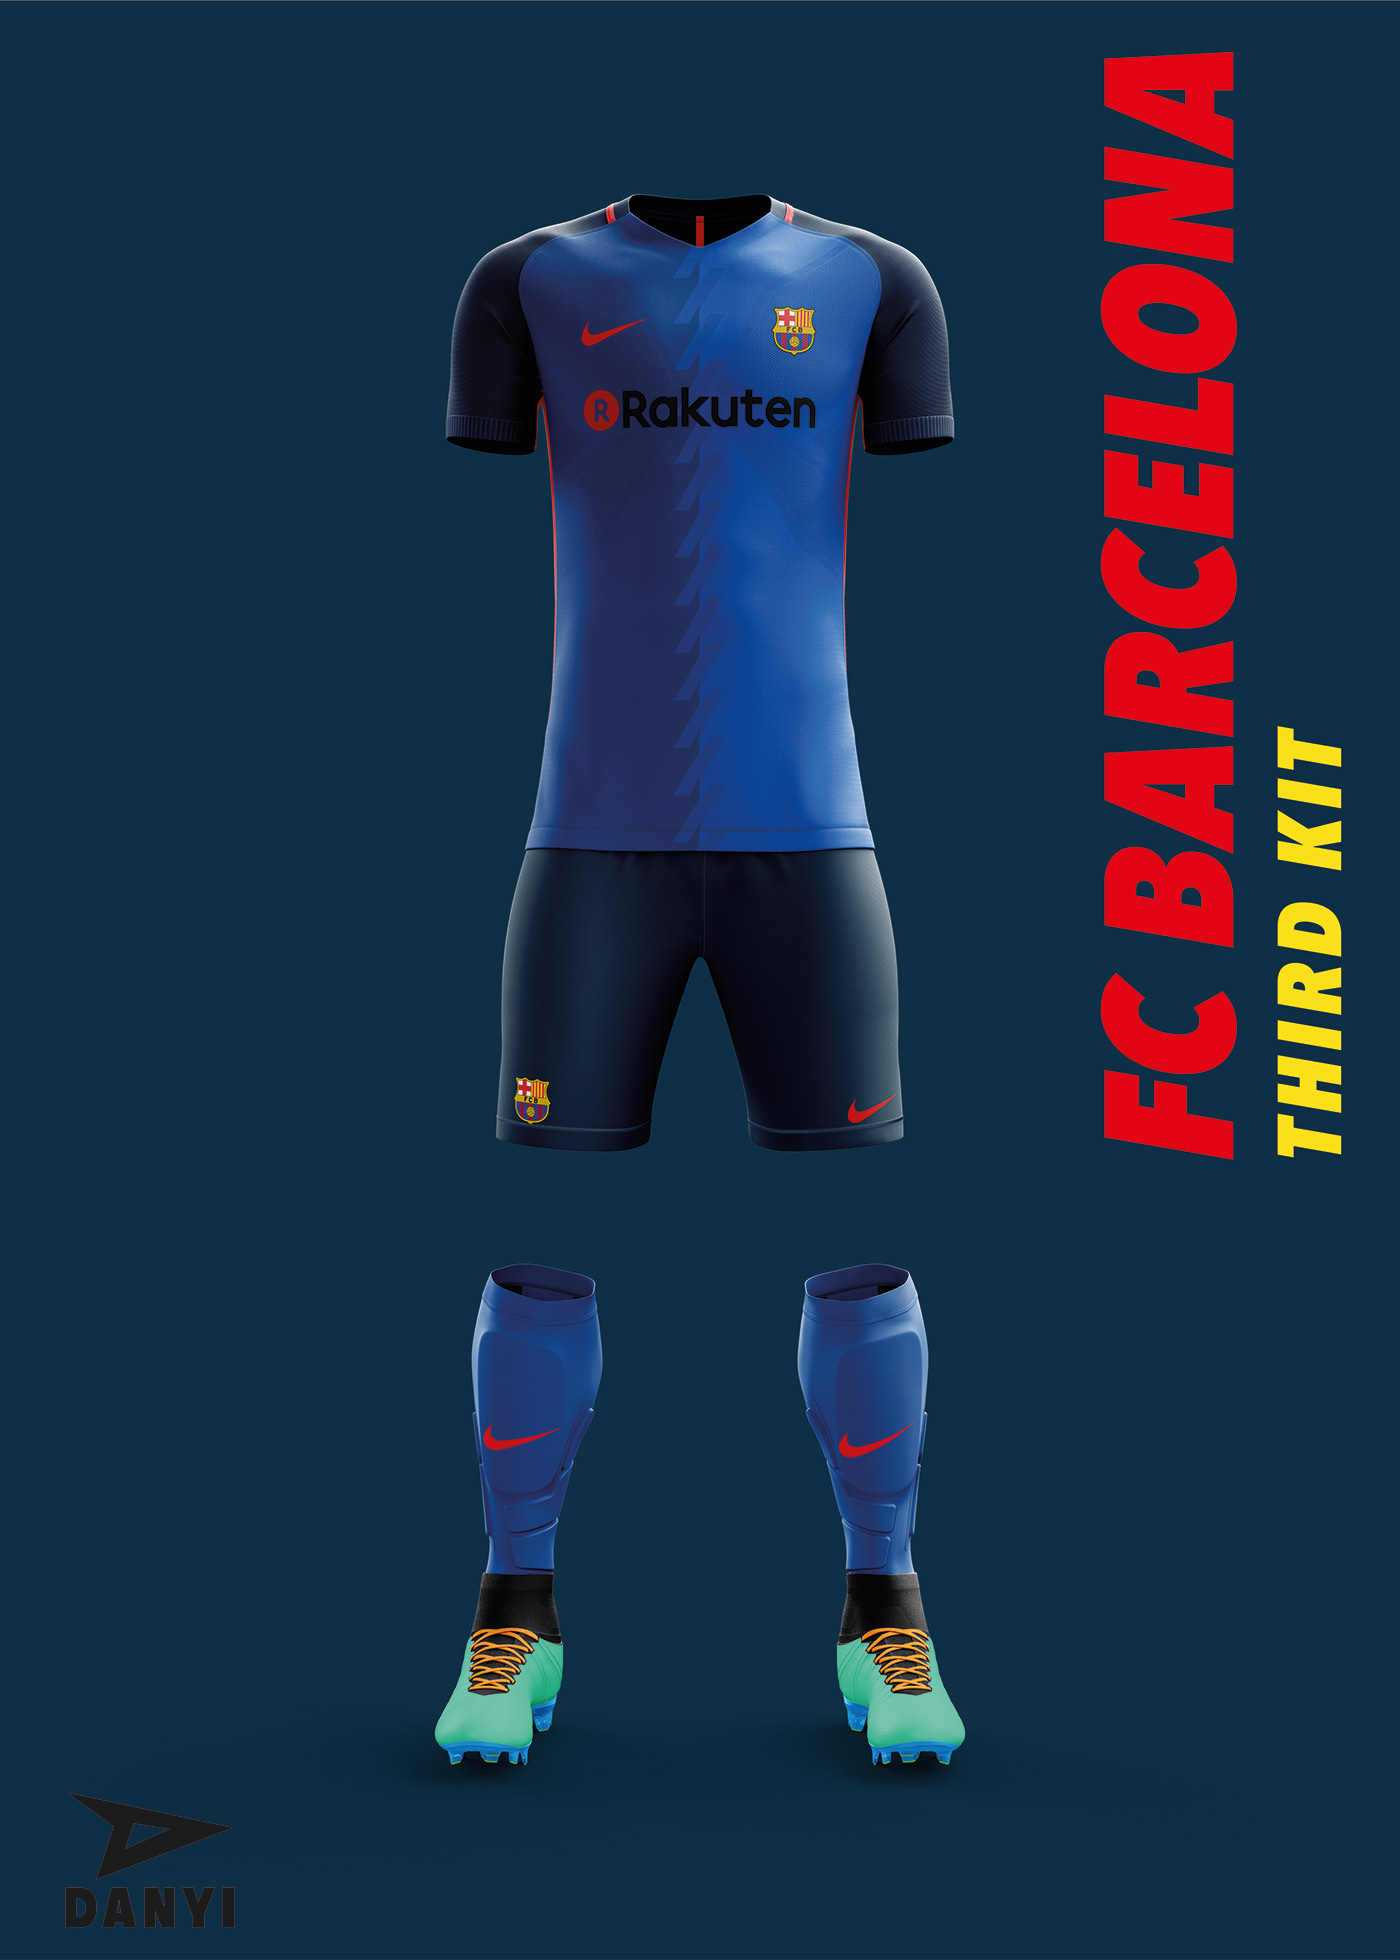 Fc Barcelona Kit 512X512 – Galleria Immagini Immagini Club